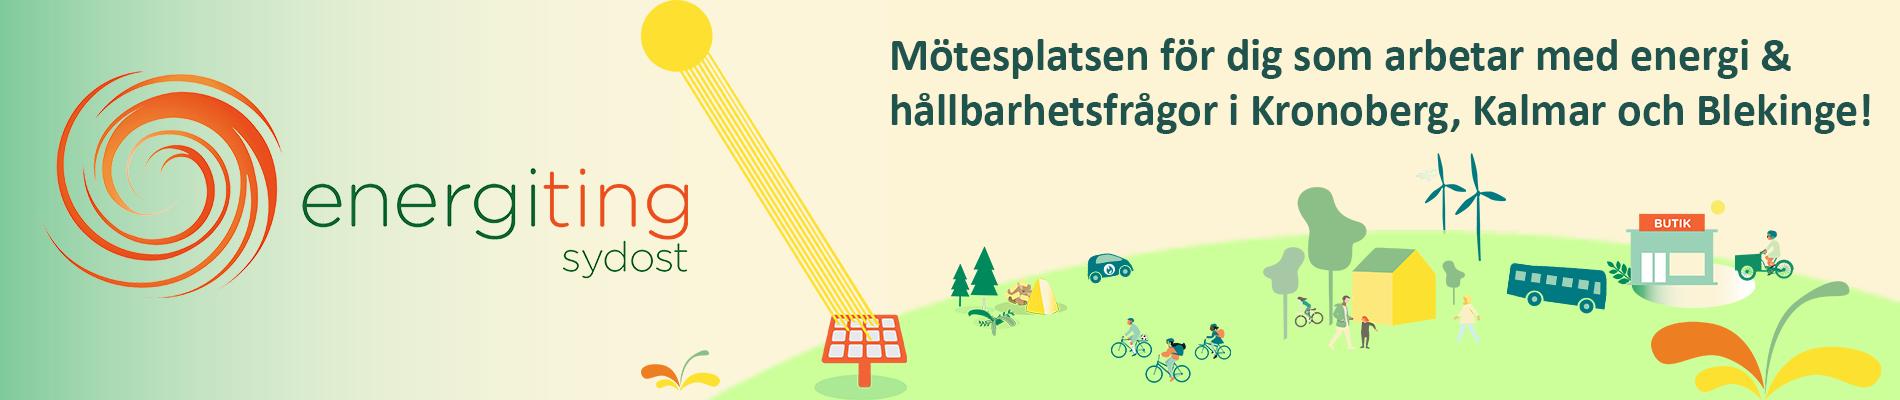 EnergiTing Sydost 2020 den 12 november i Karlskrona